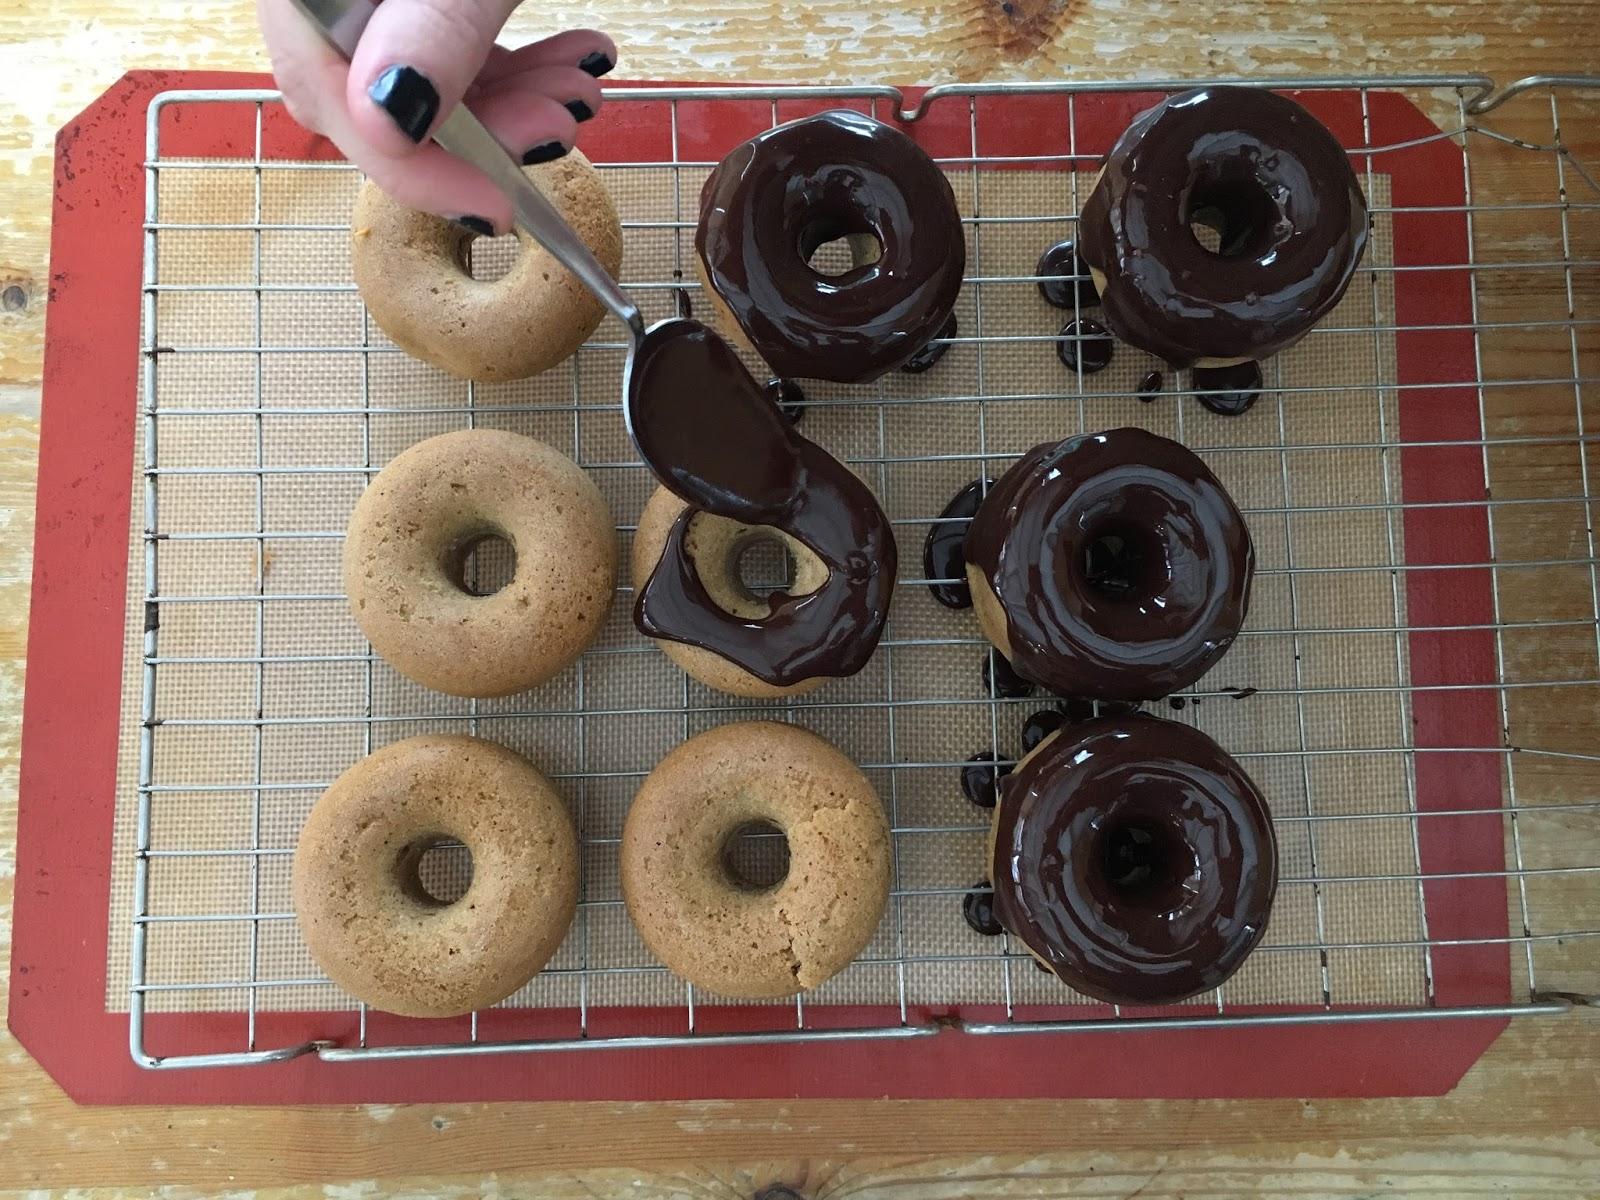 Vegan Cinnamon Donuts With A Chocolate Glaze